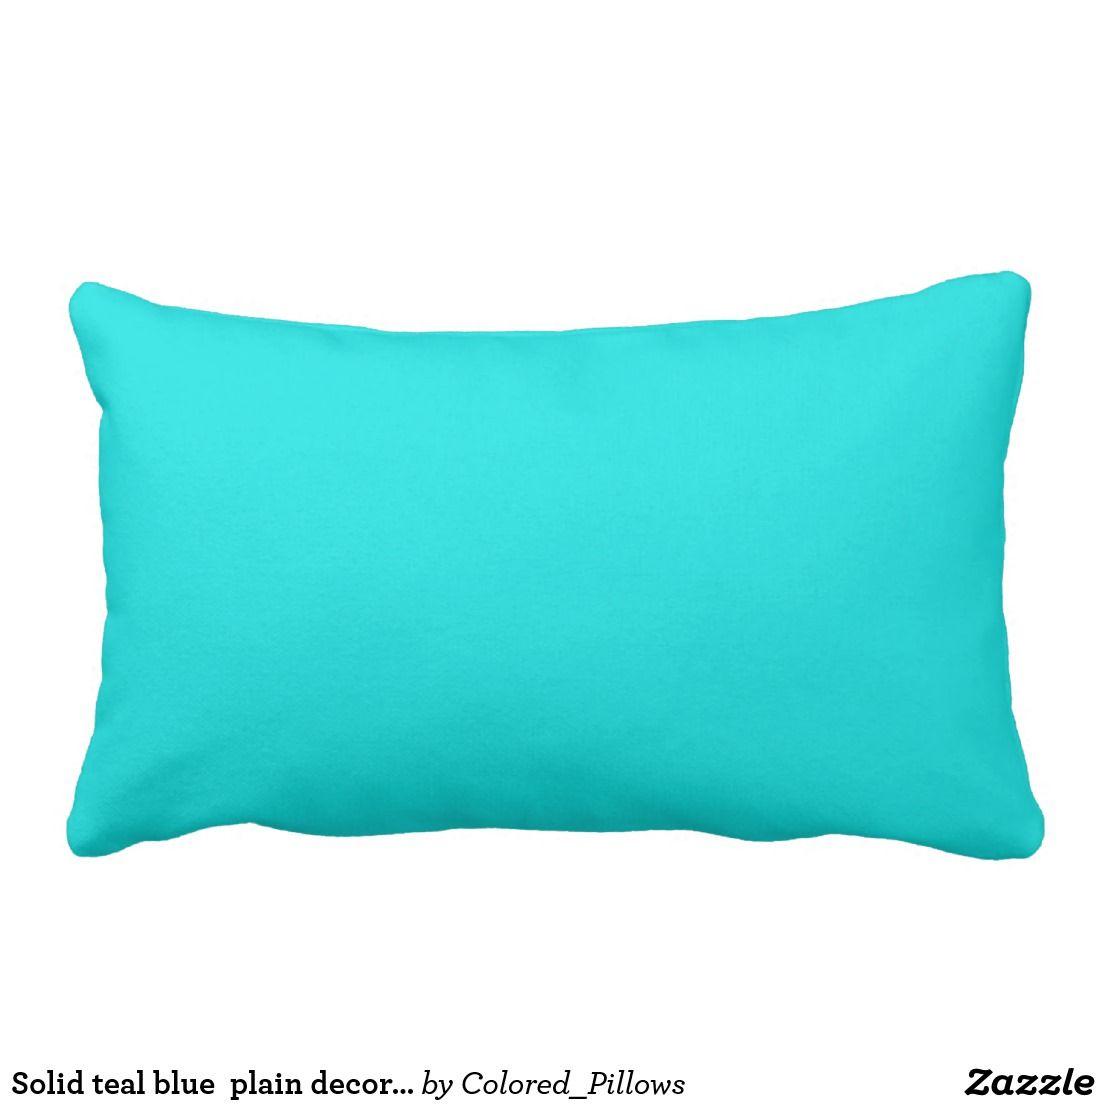 Outstanding Solid Teal Blue Plain Decorative Color Lumbar Pillow Uwap Interior Chair Design Uwaporg